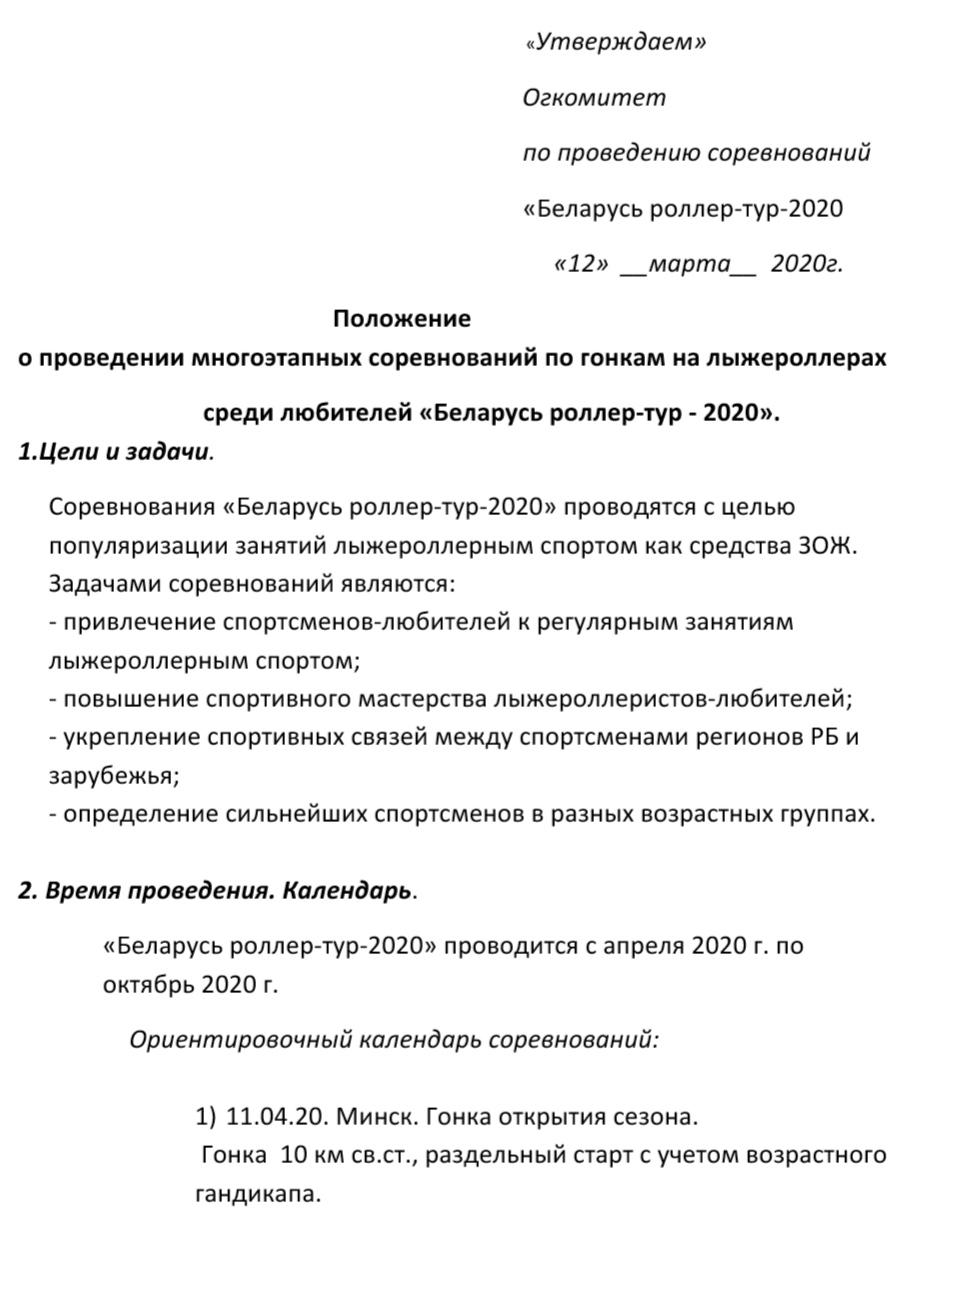 IMG_20200312_182826